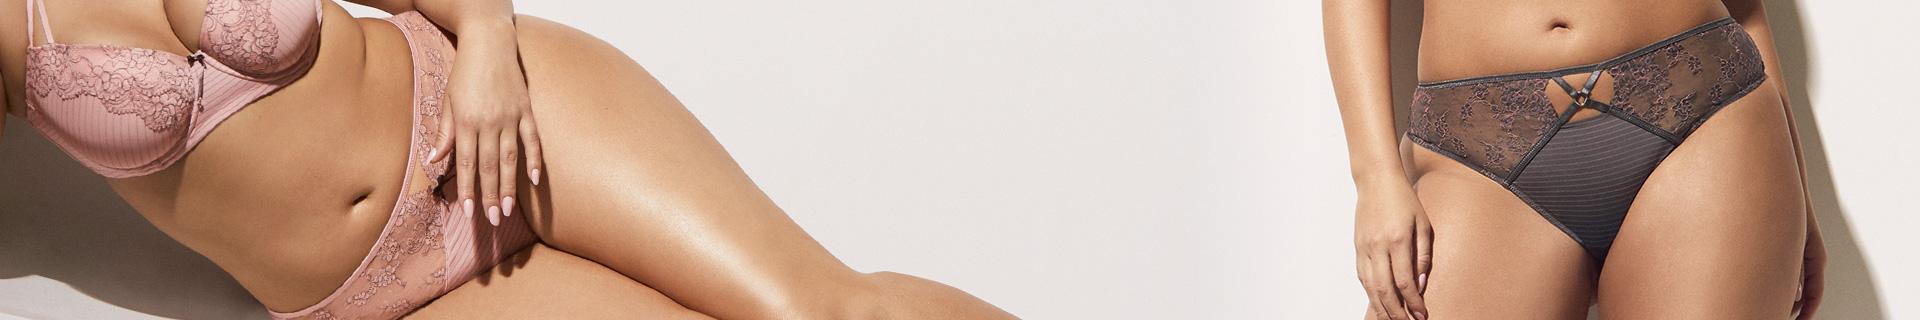 Ashley Graham panties